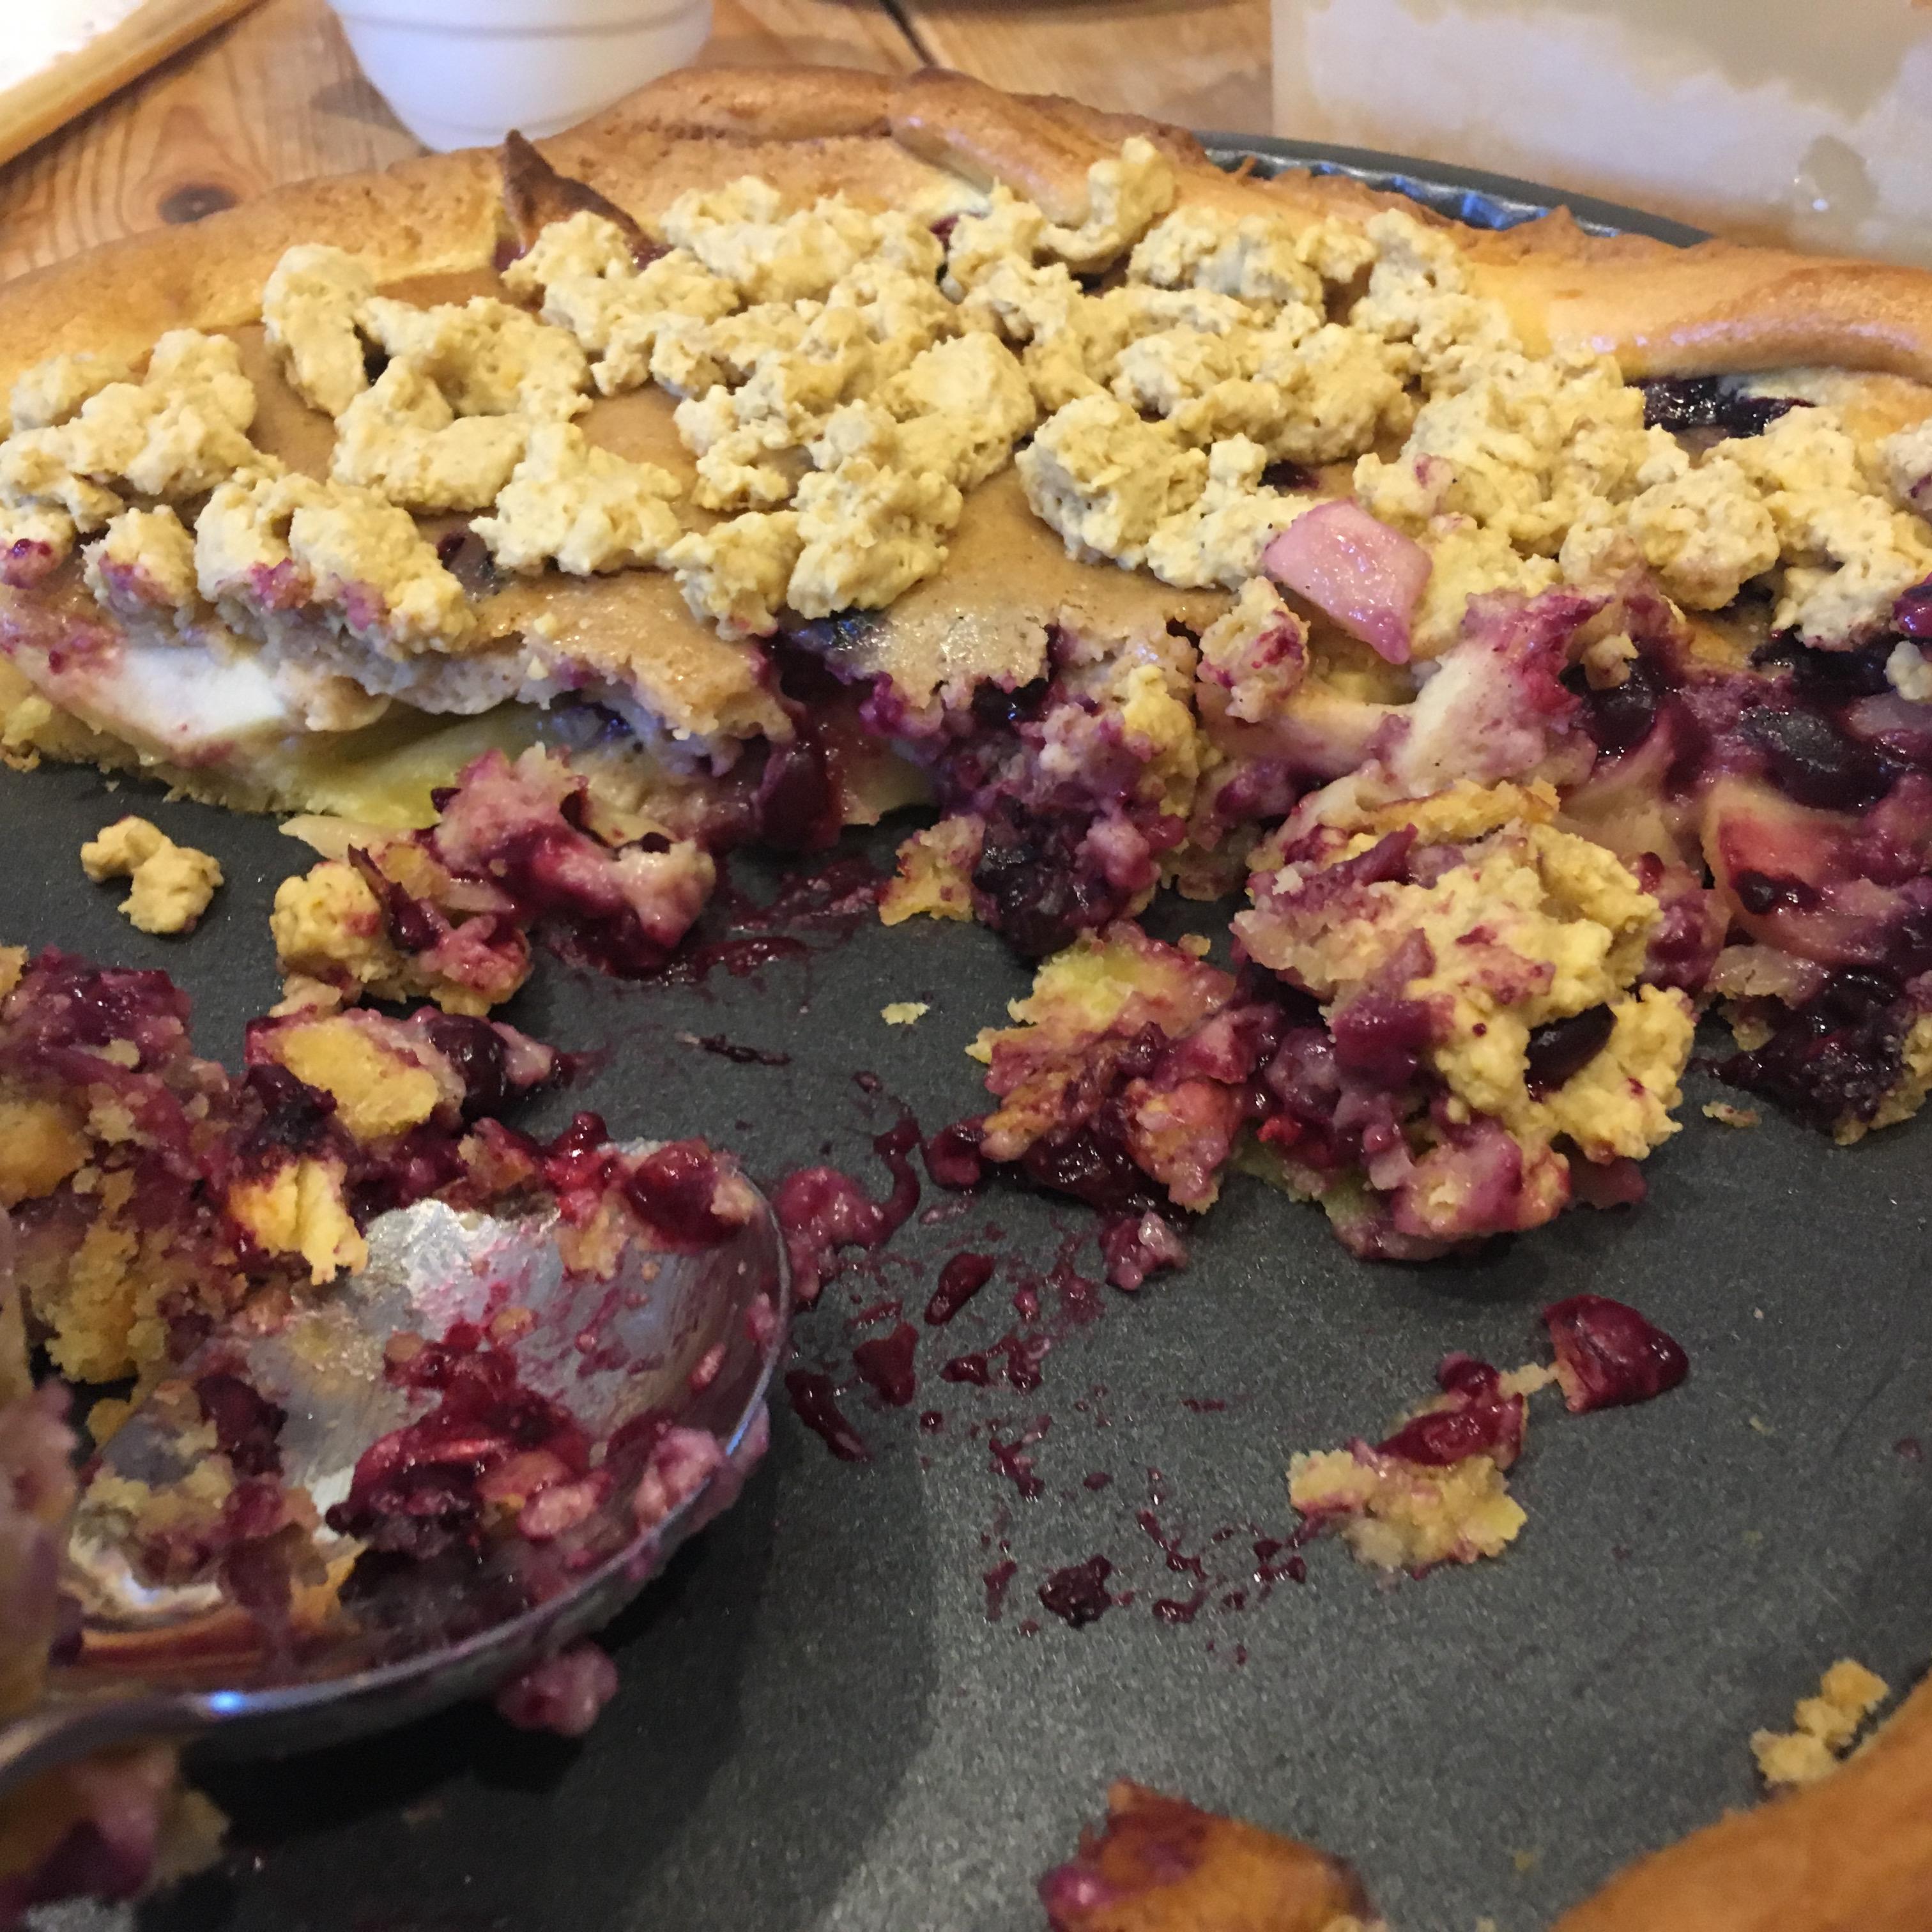 Creamy Apple Blueberry Pie